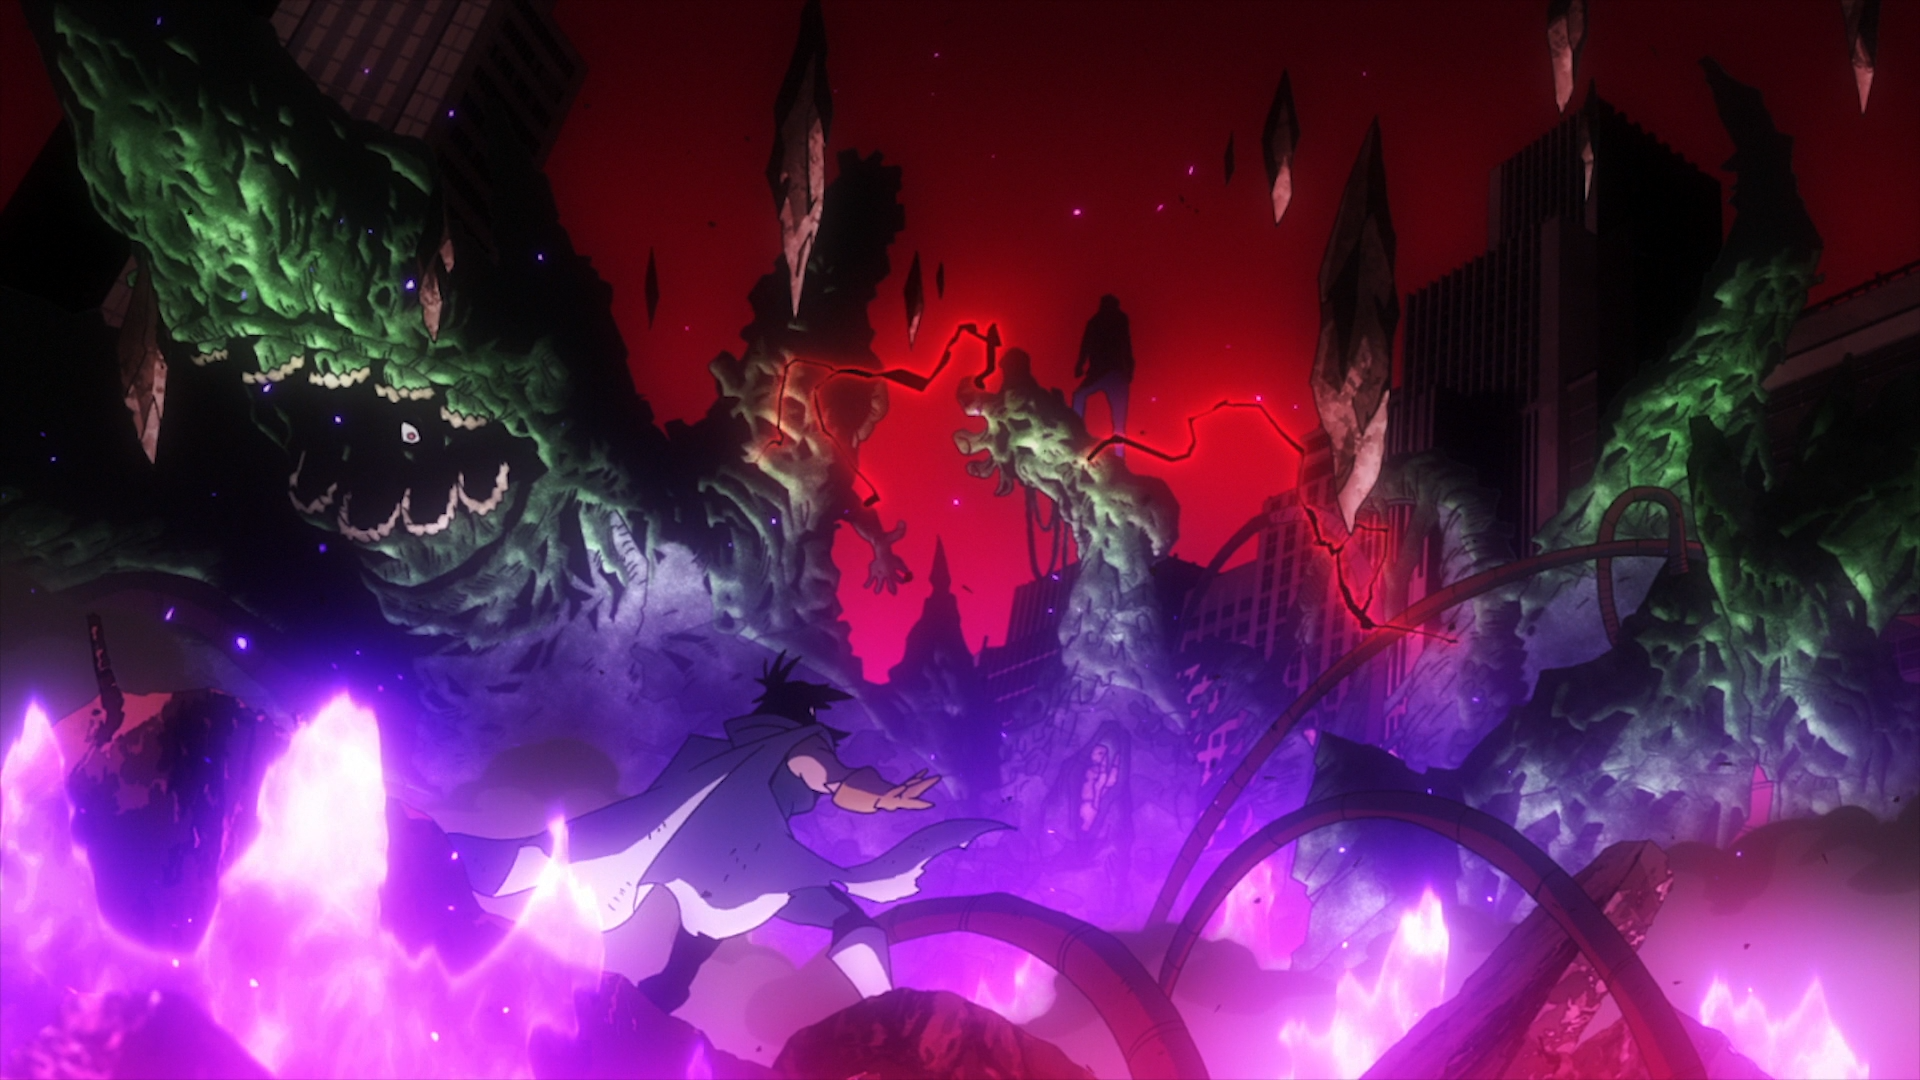 Nana Shimura vs. All For One